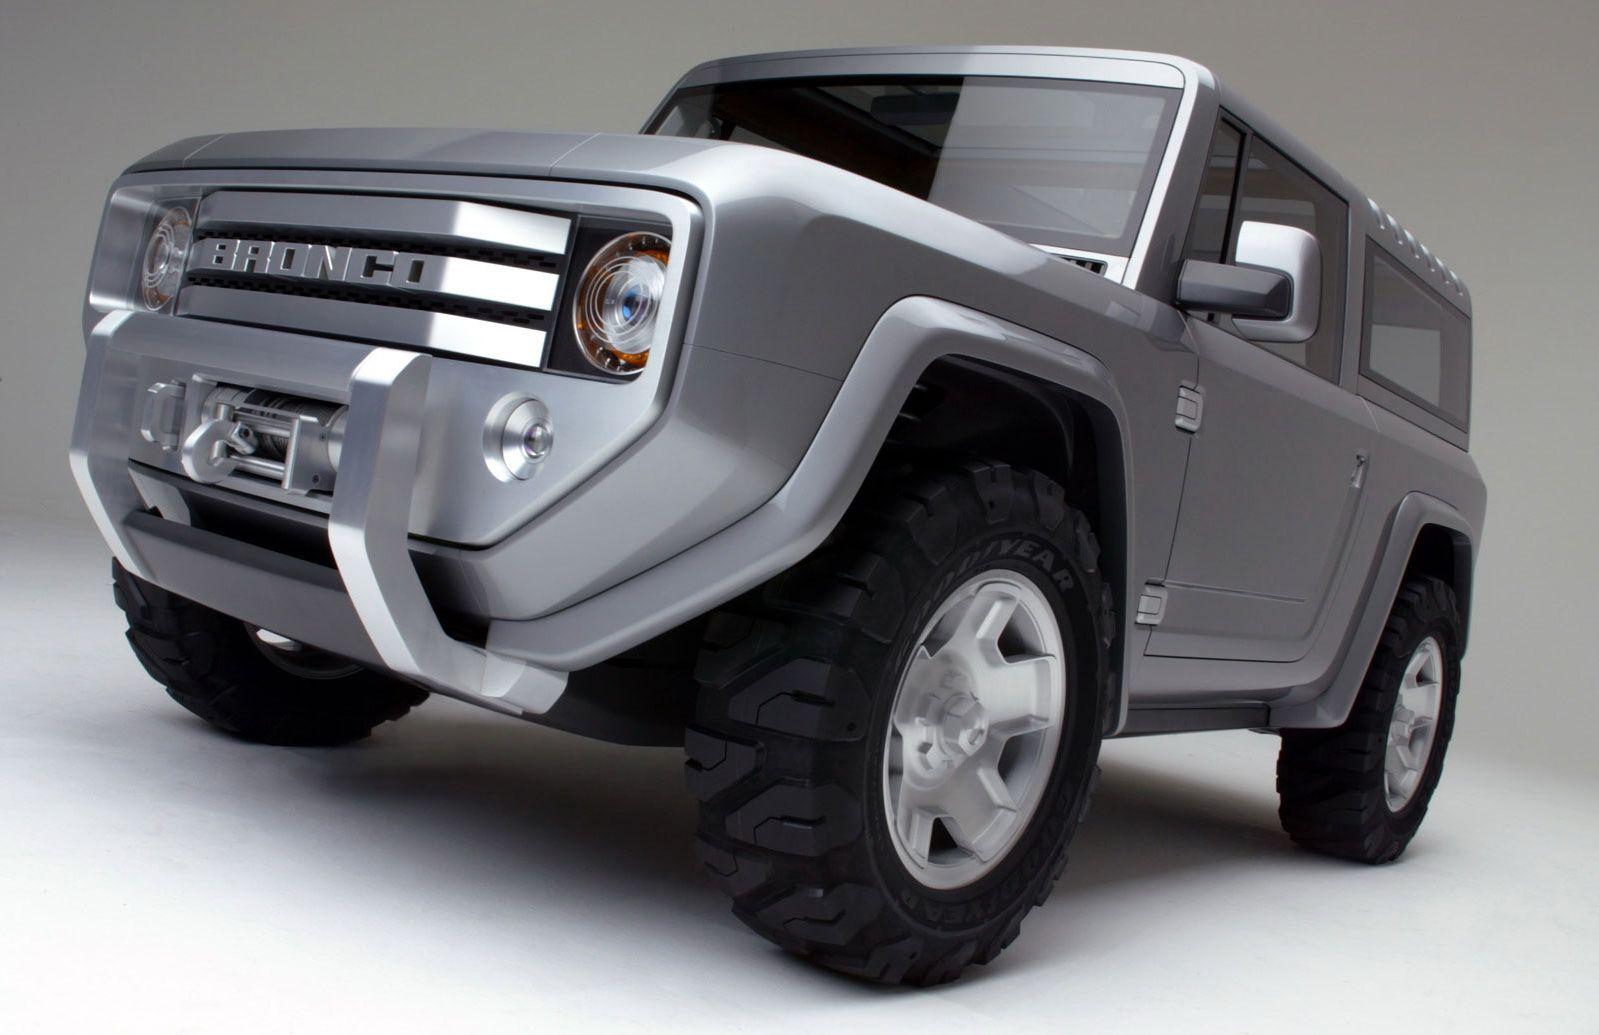 Upcoming dodge ram and jeep trucks and suvs concept rides pinterest dodge dakota dodge and jeep truck